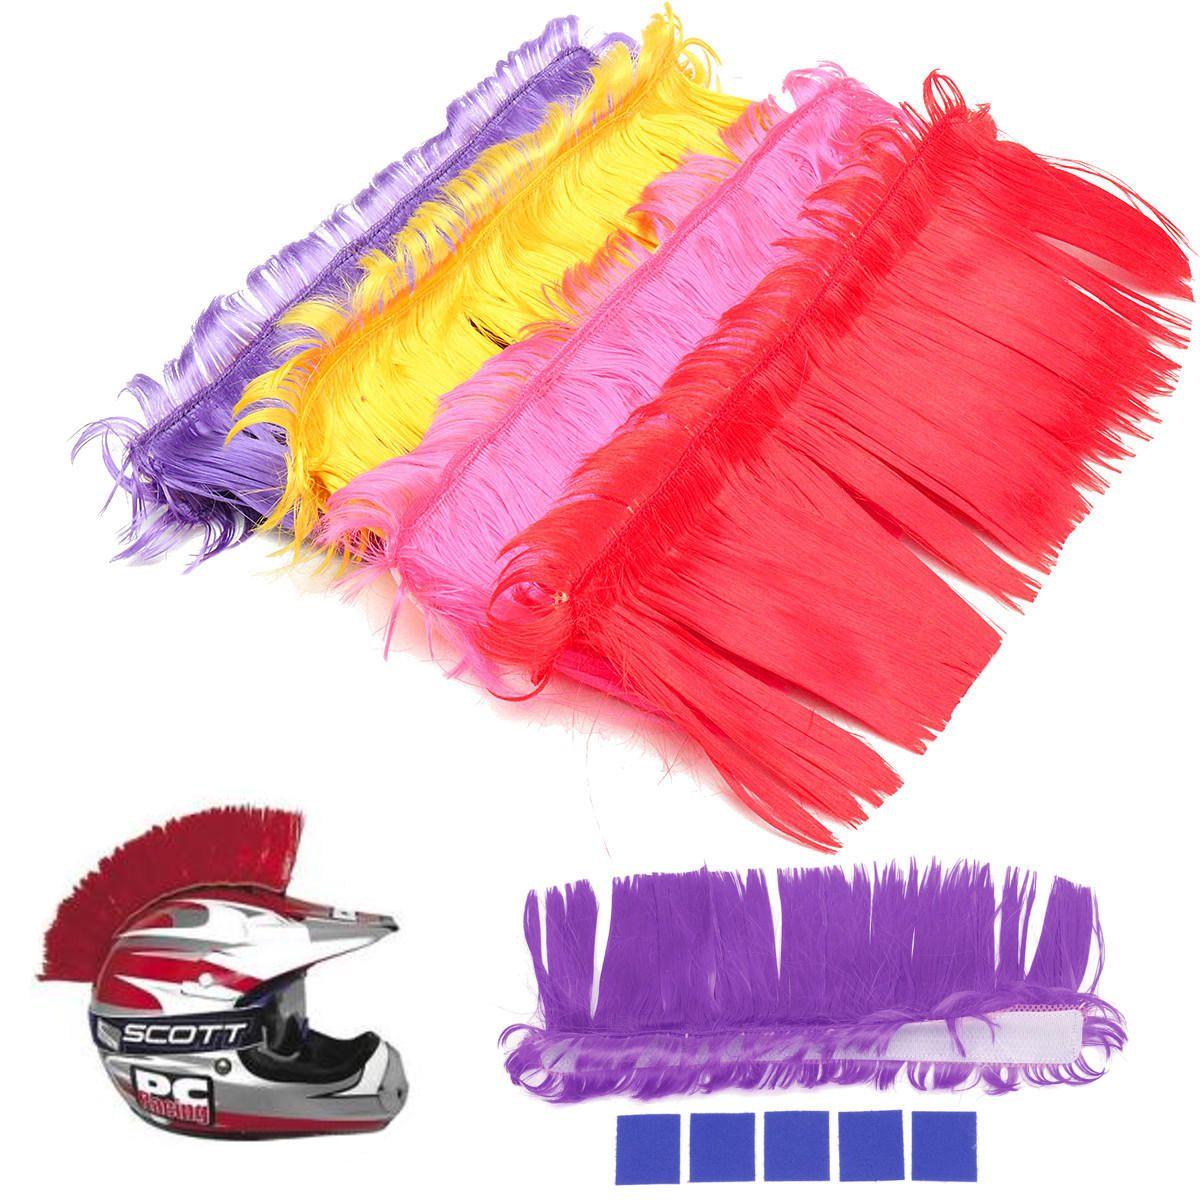 Helmet mohawk hair punk hair for motorcycle helmets ski snowboard